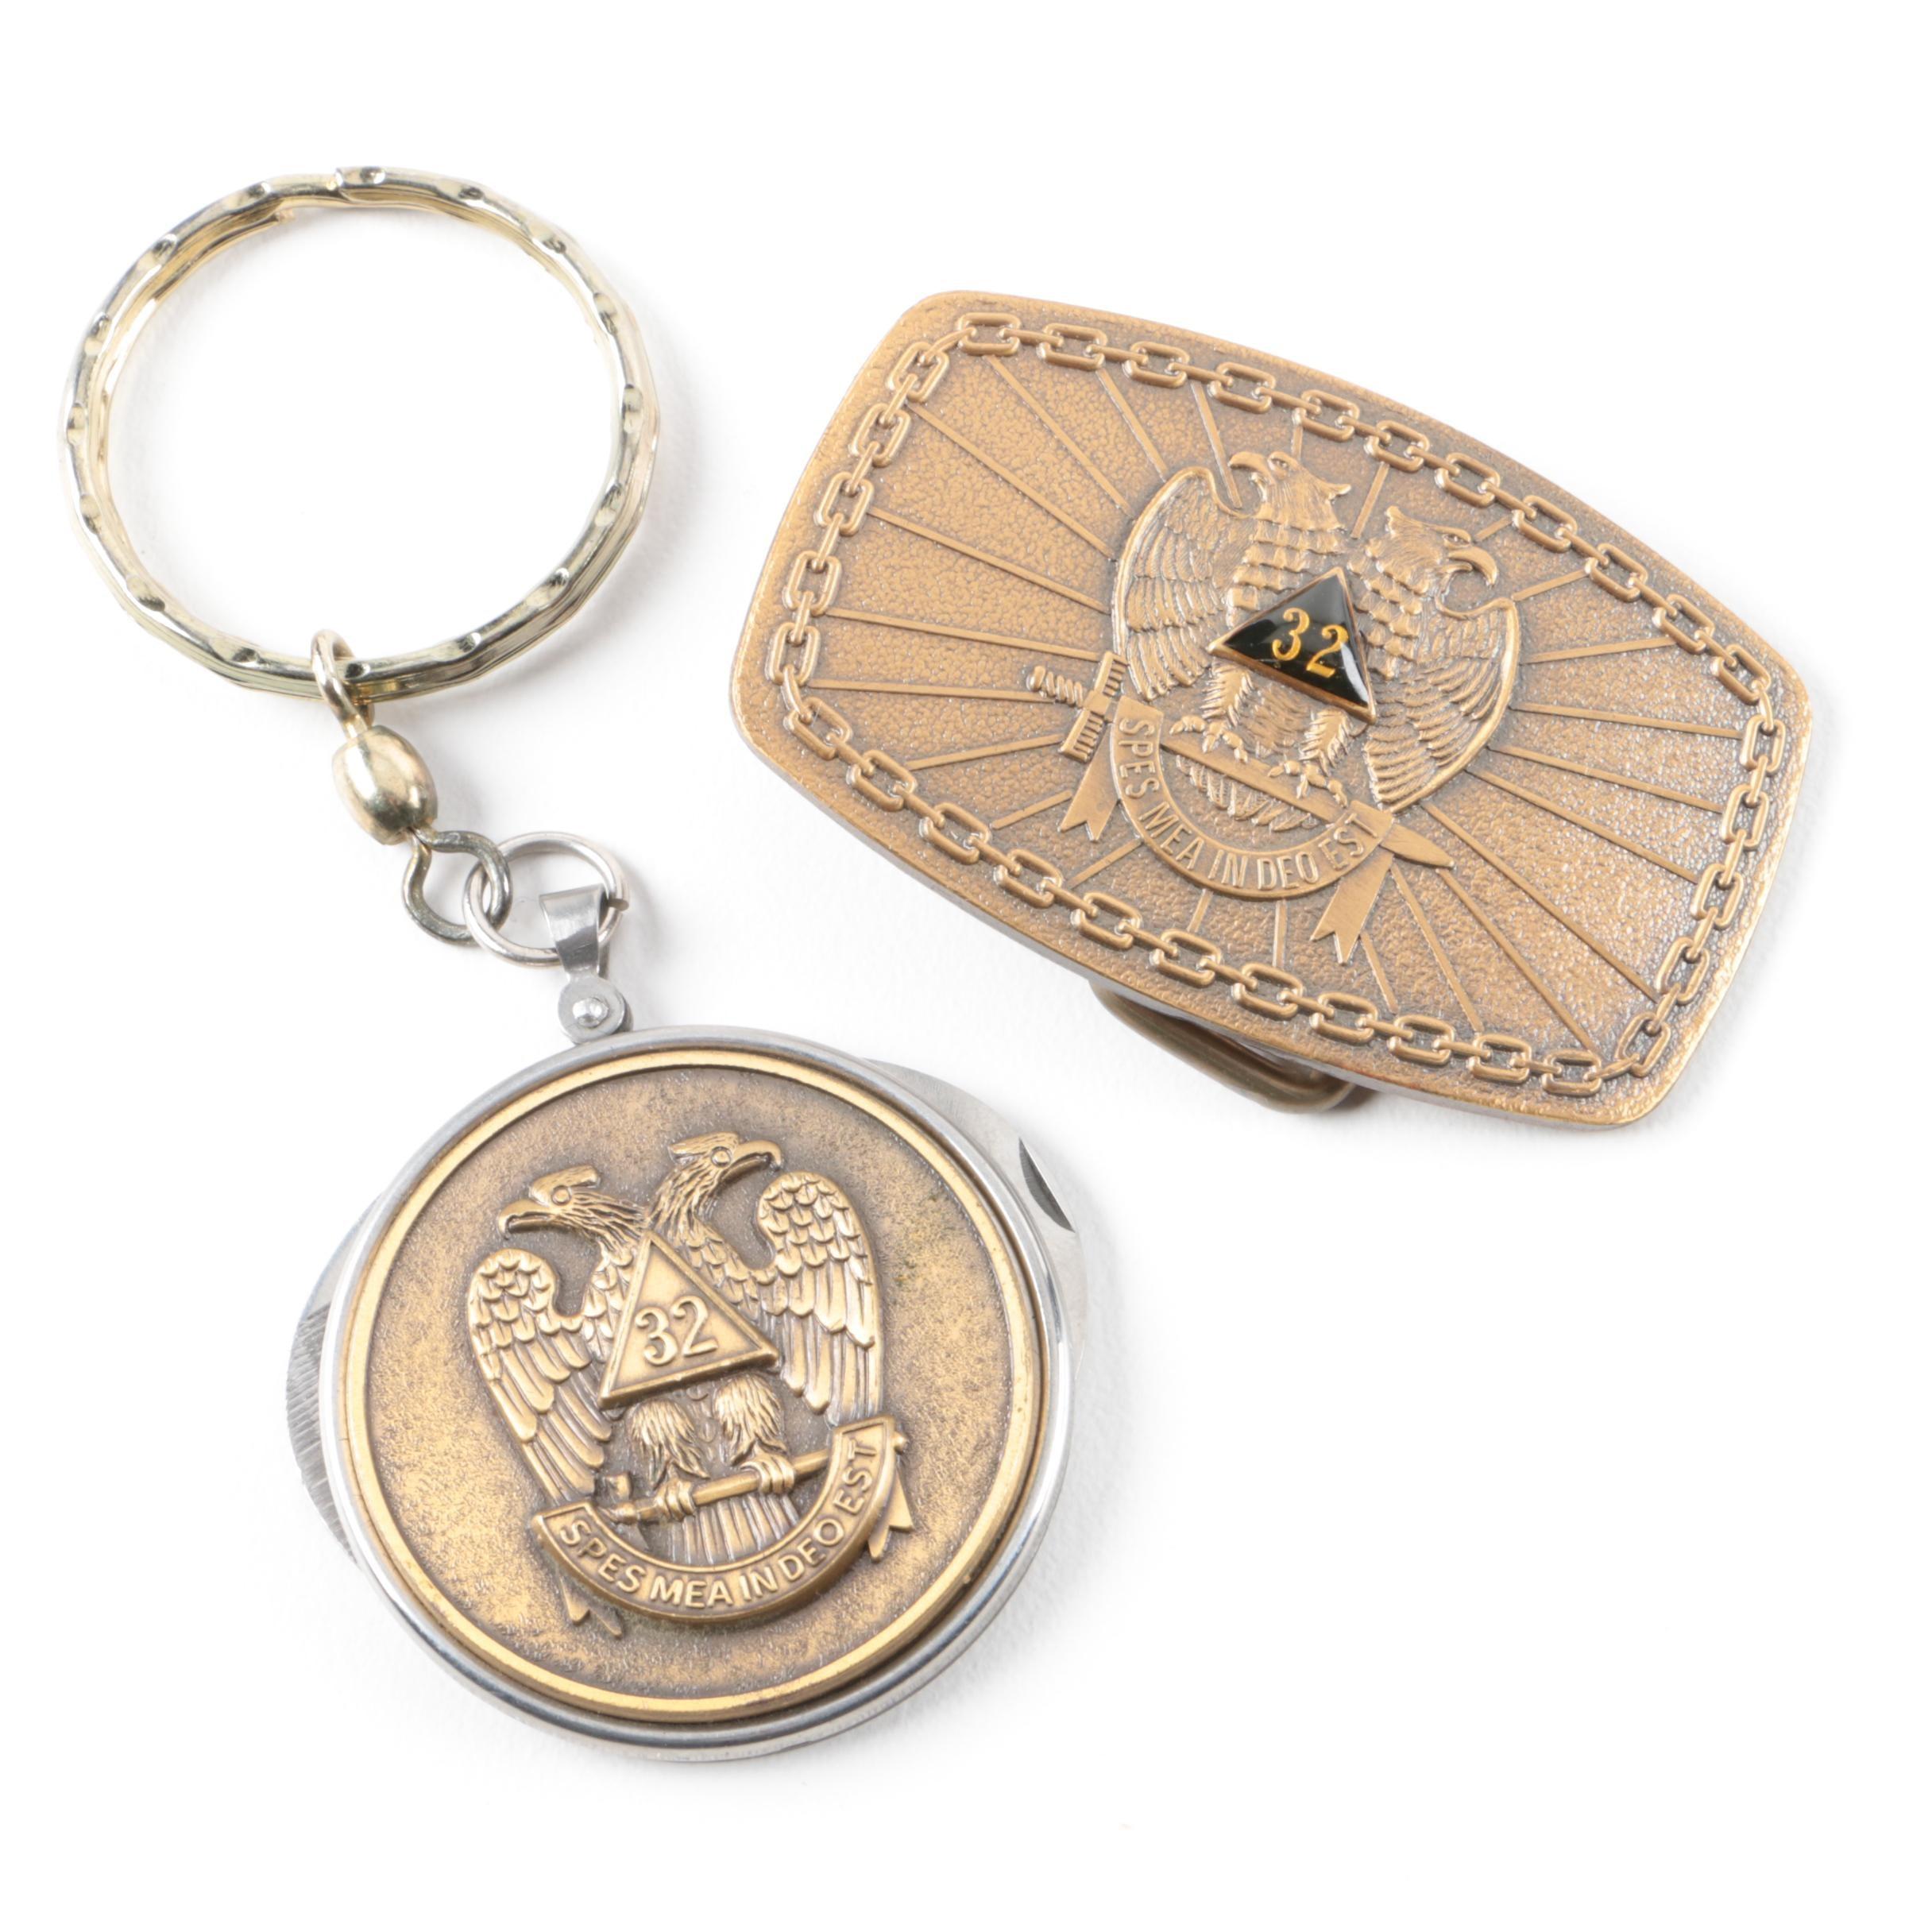 Vintage 32° Scottish Rite Freemasonry Belt Buckle and Knife Keychain